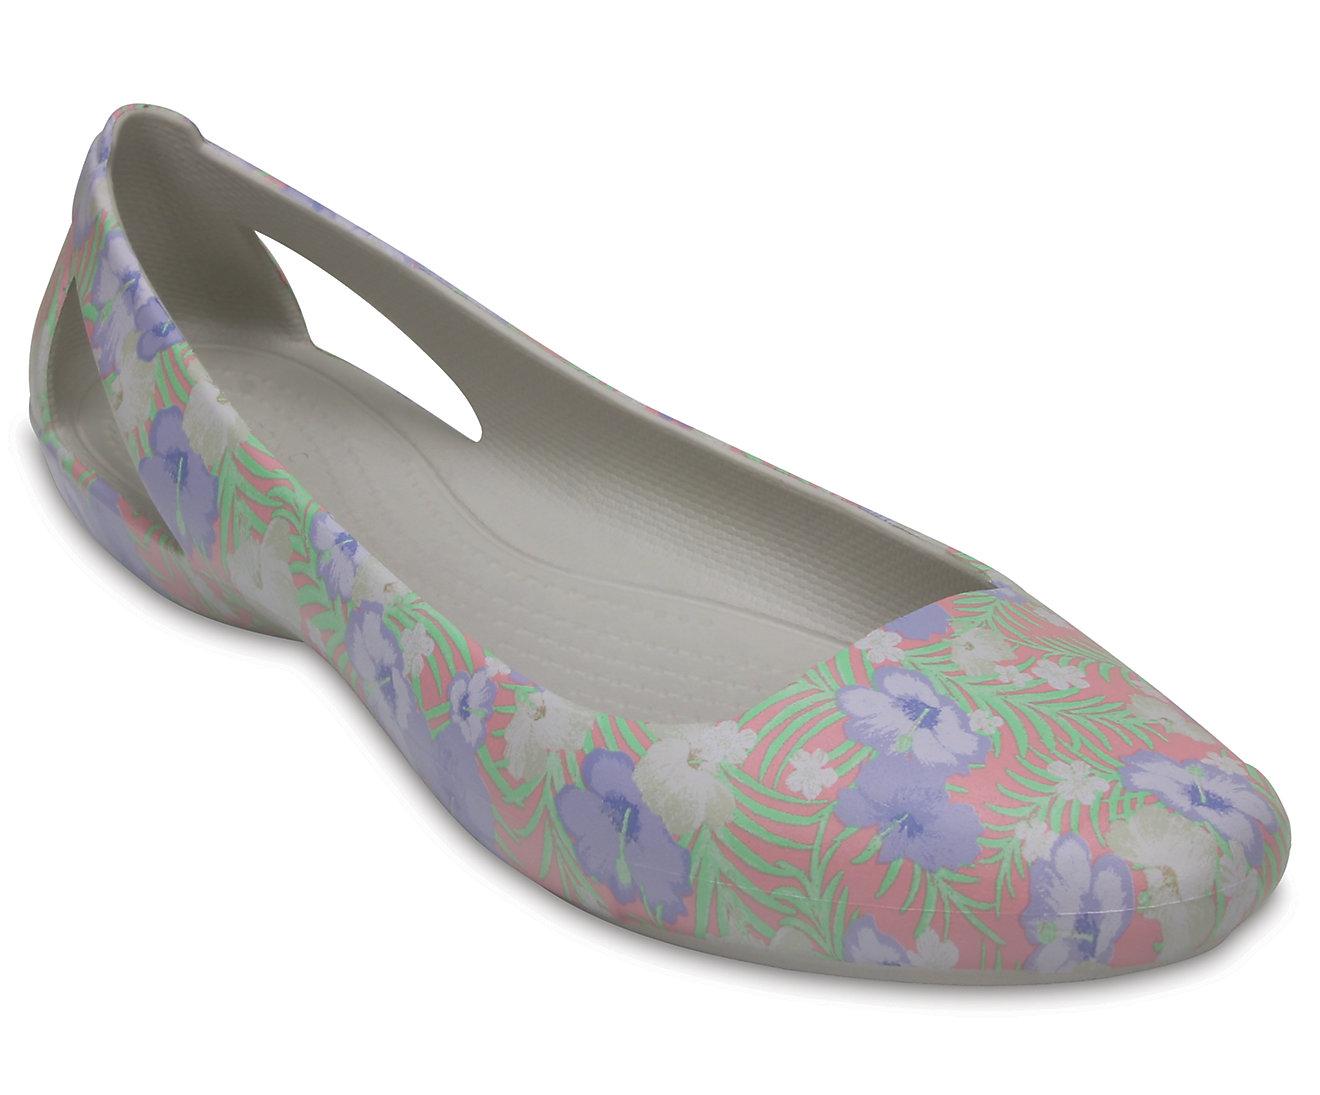 Women's Crocs Sienna Graphic Flat